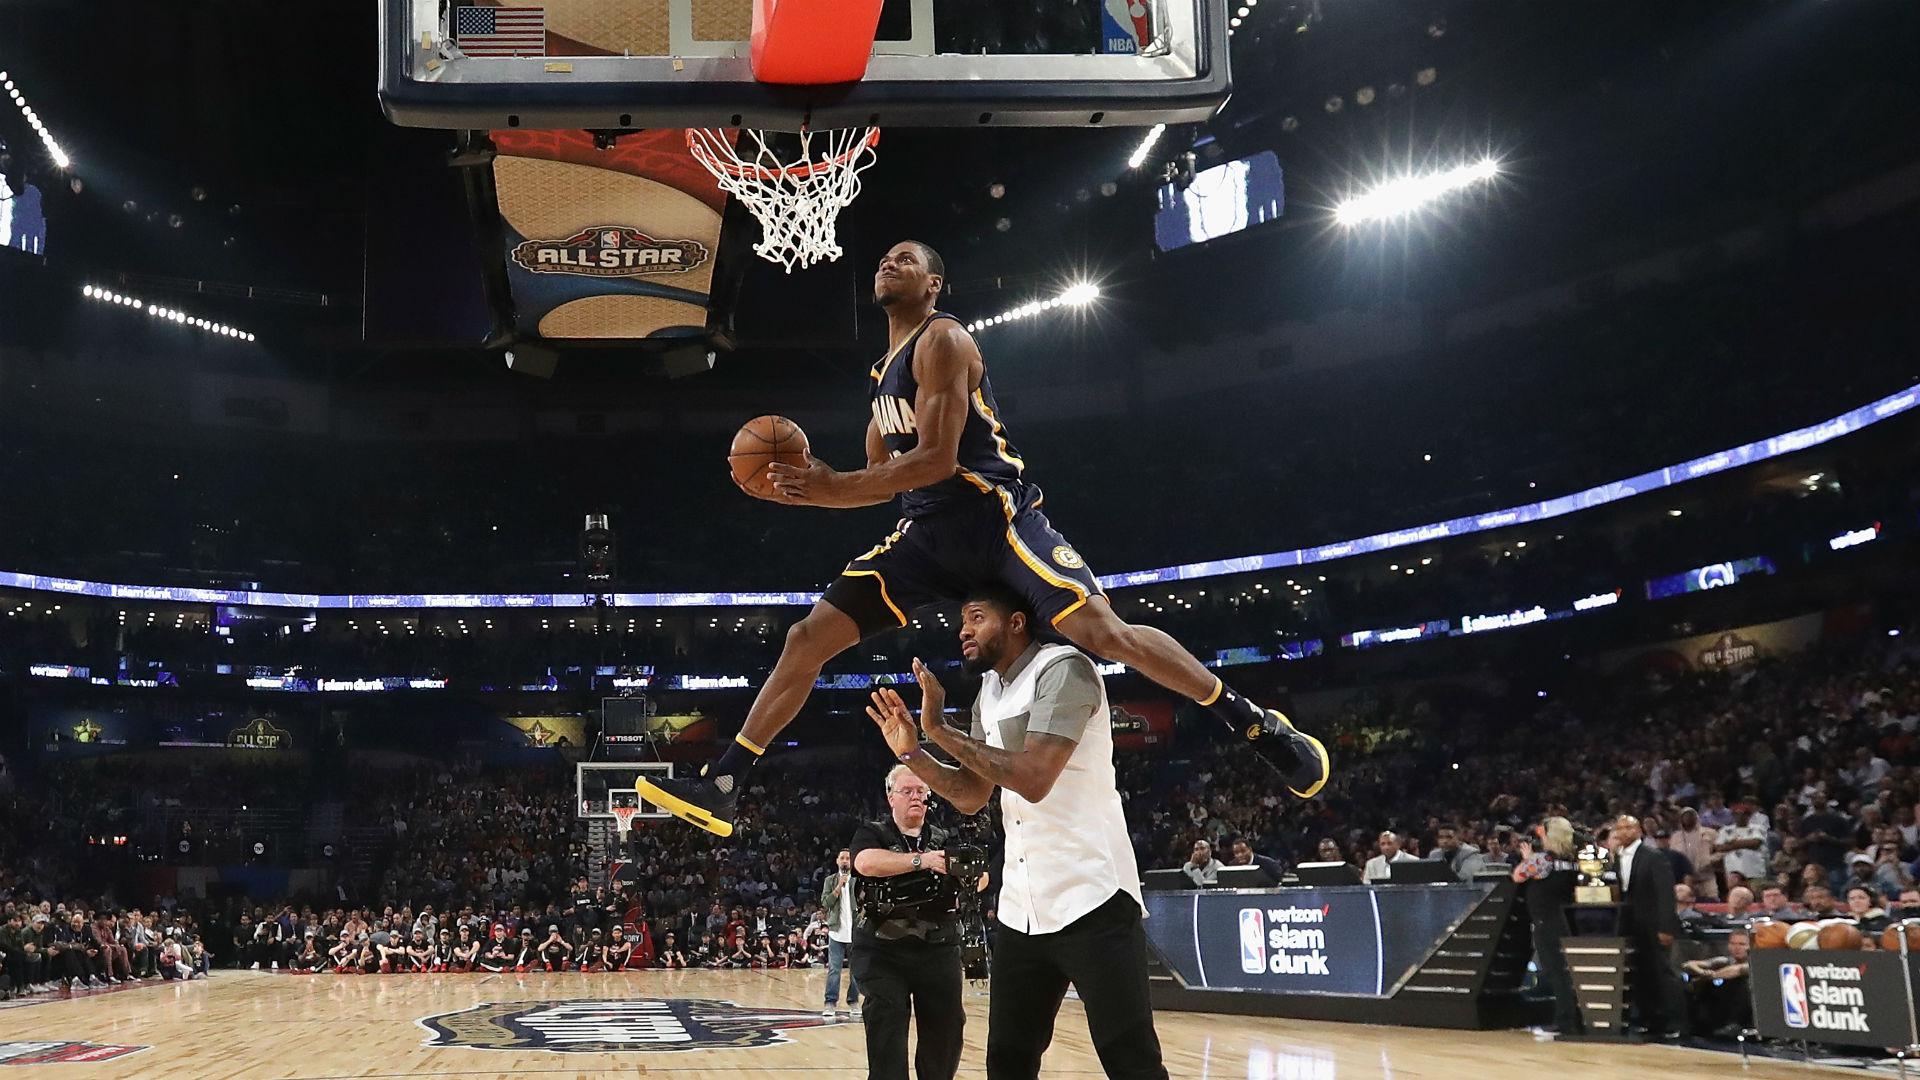 NBA All-Star Weekend 2017: Slam Dunk Contest updates, highlights, results | NBA | Sporting News